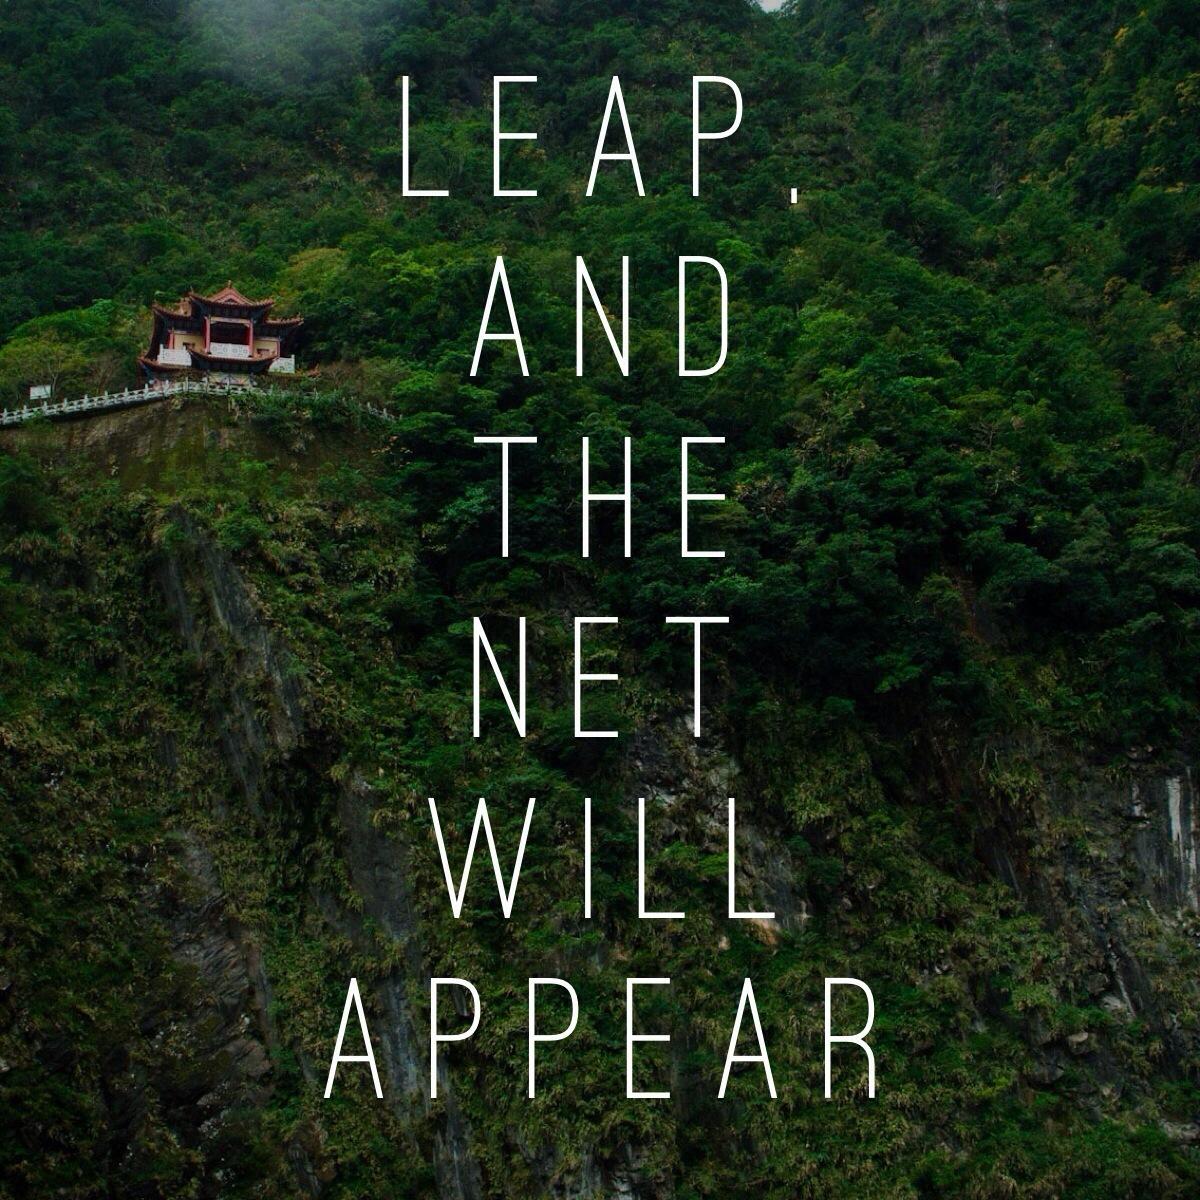 trust faith without fear